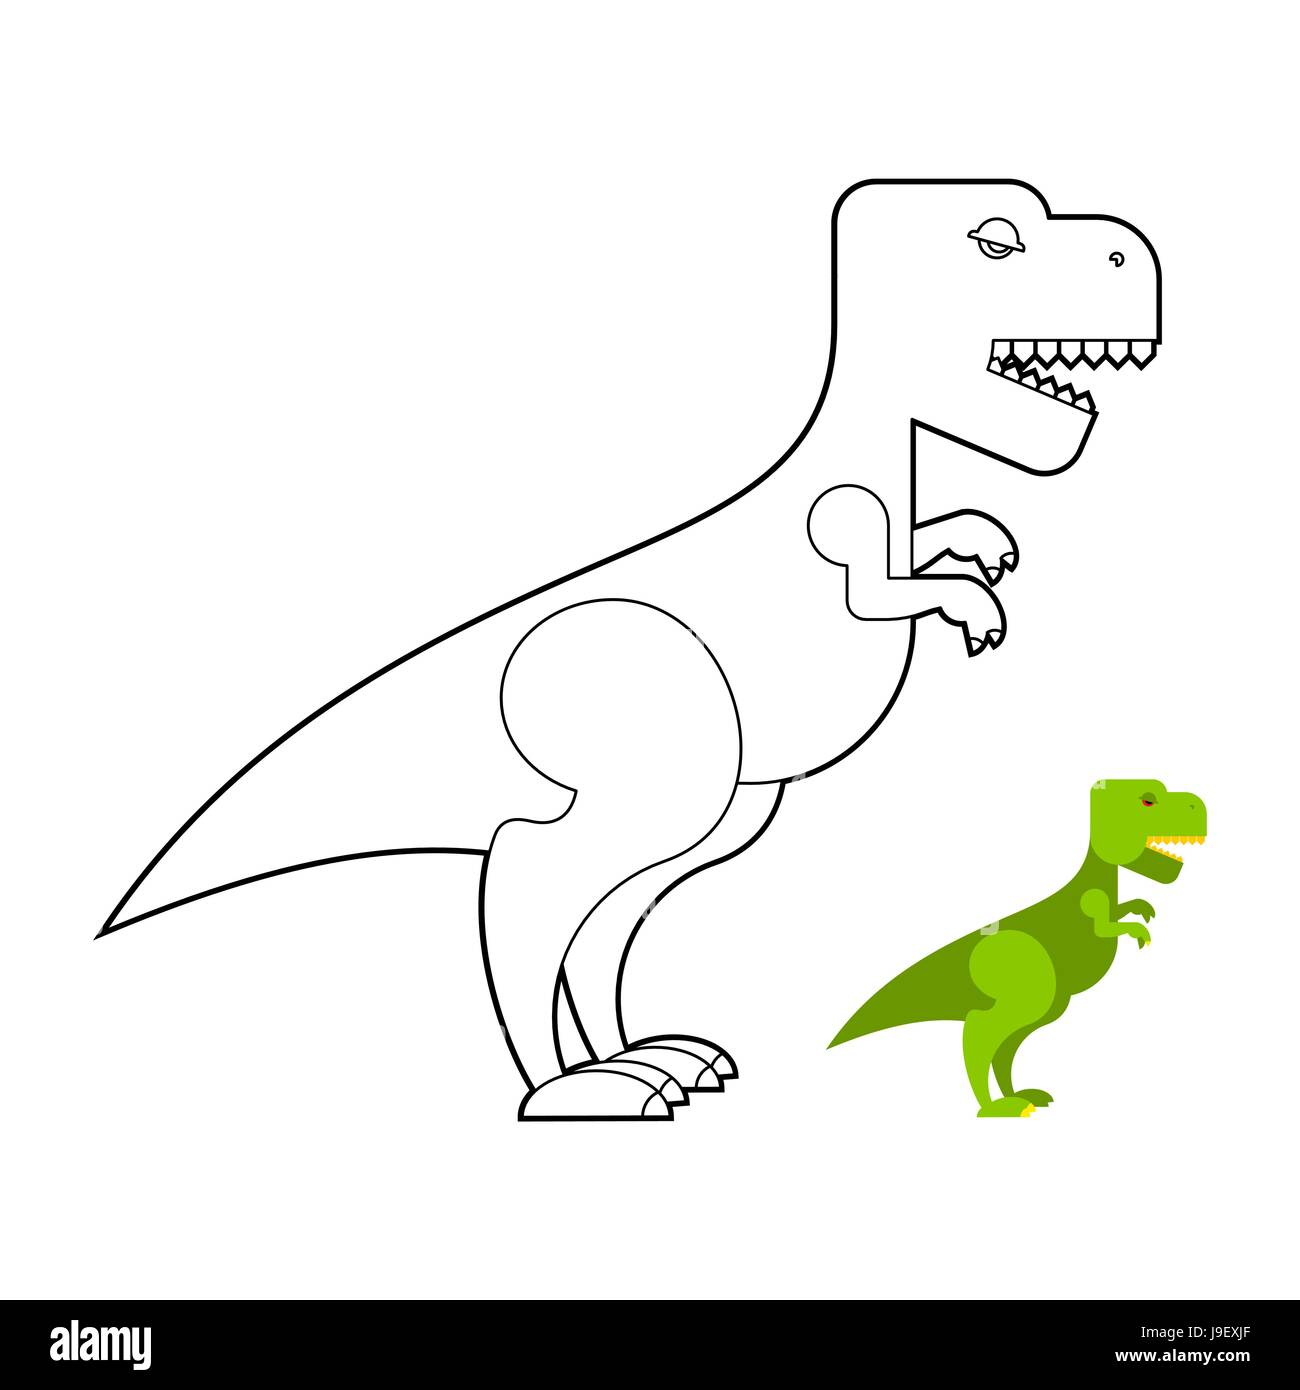 T Rex Dinosaur Coloring Book Scary Big Tyrannosaurus Prehistoric